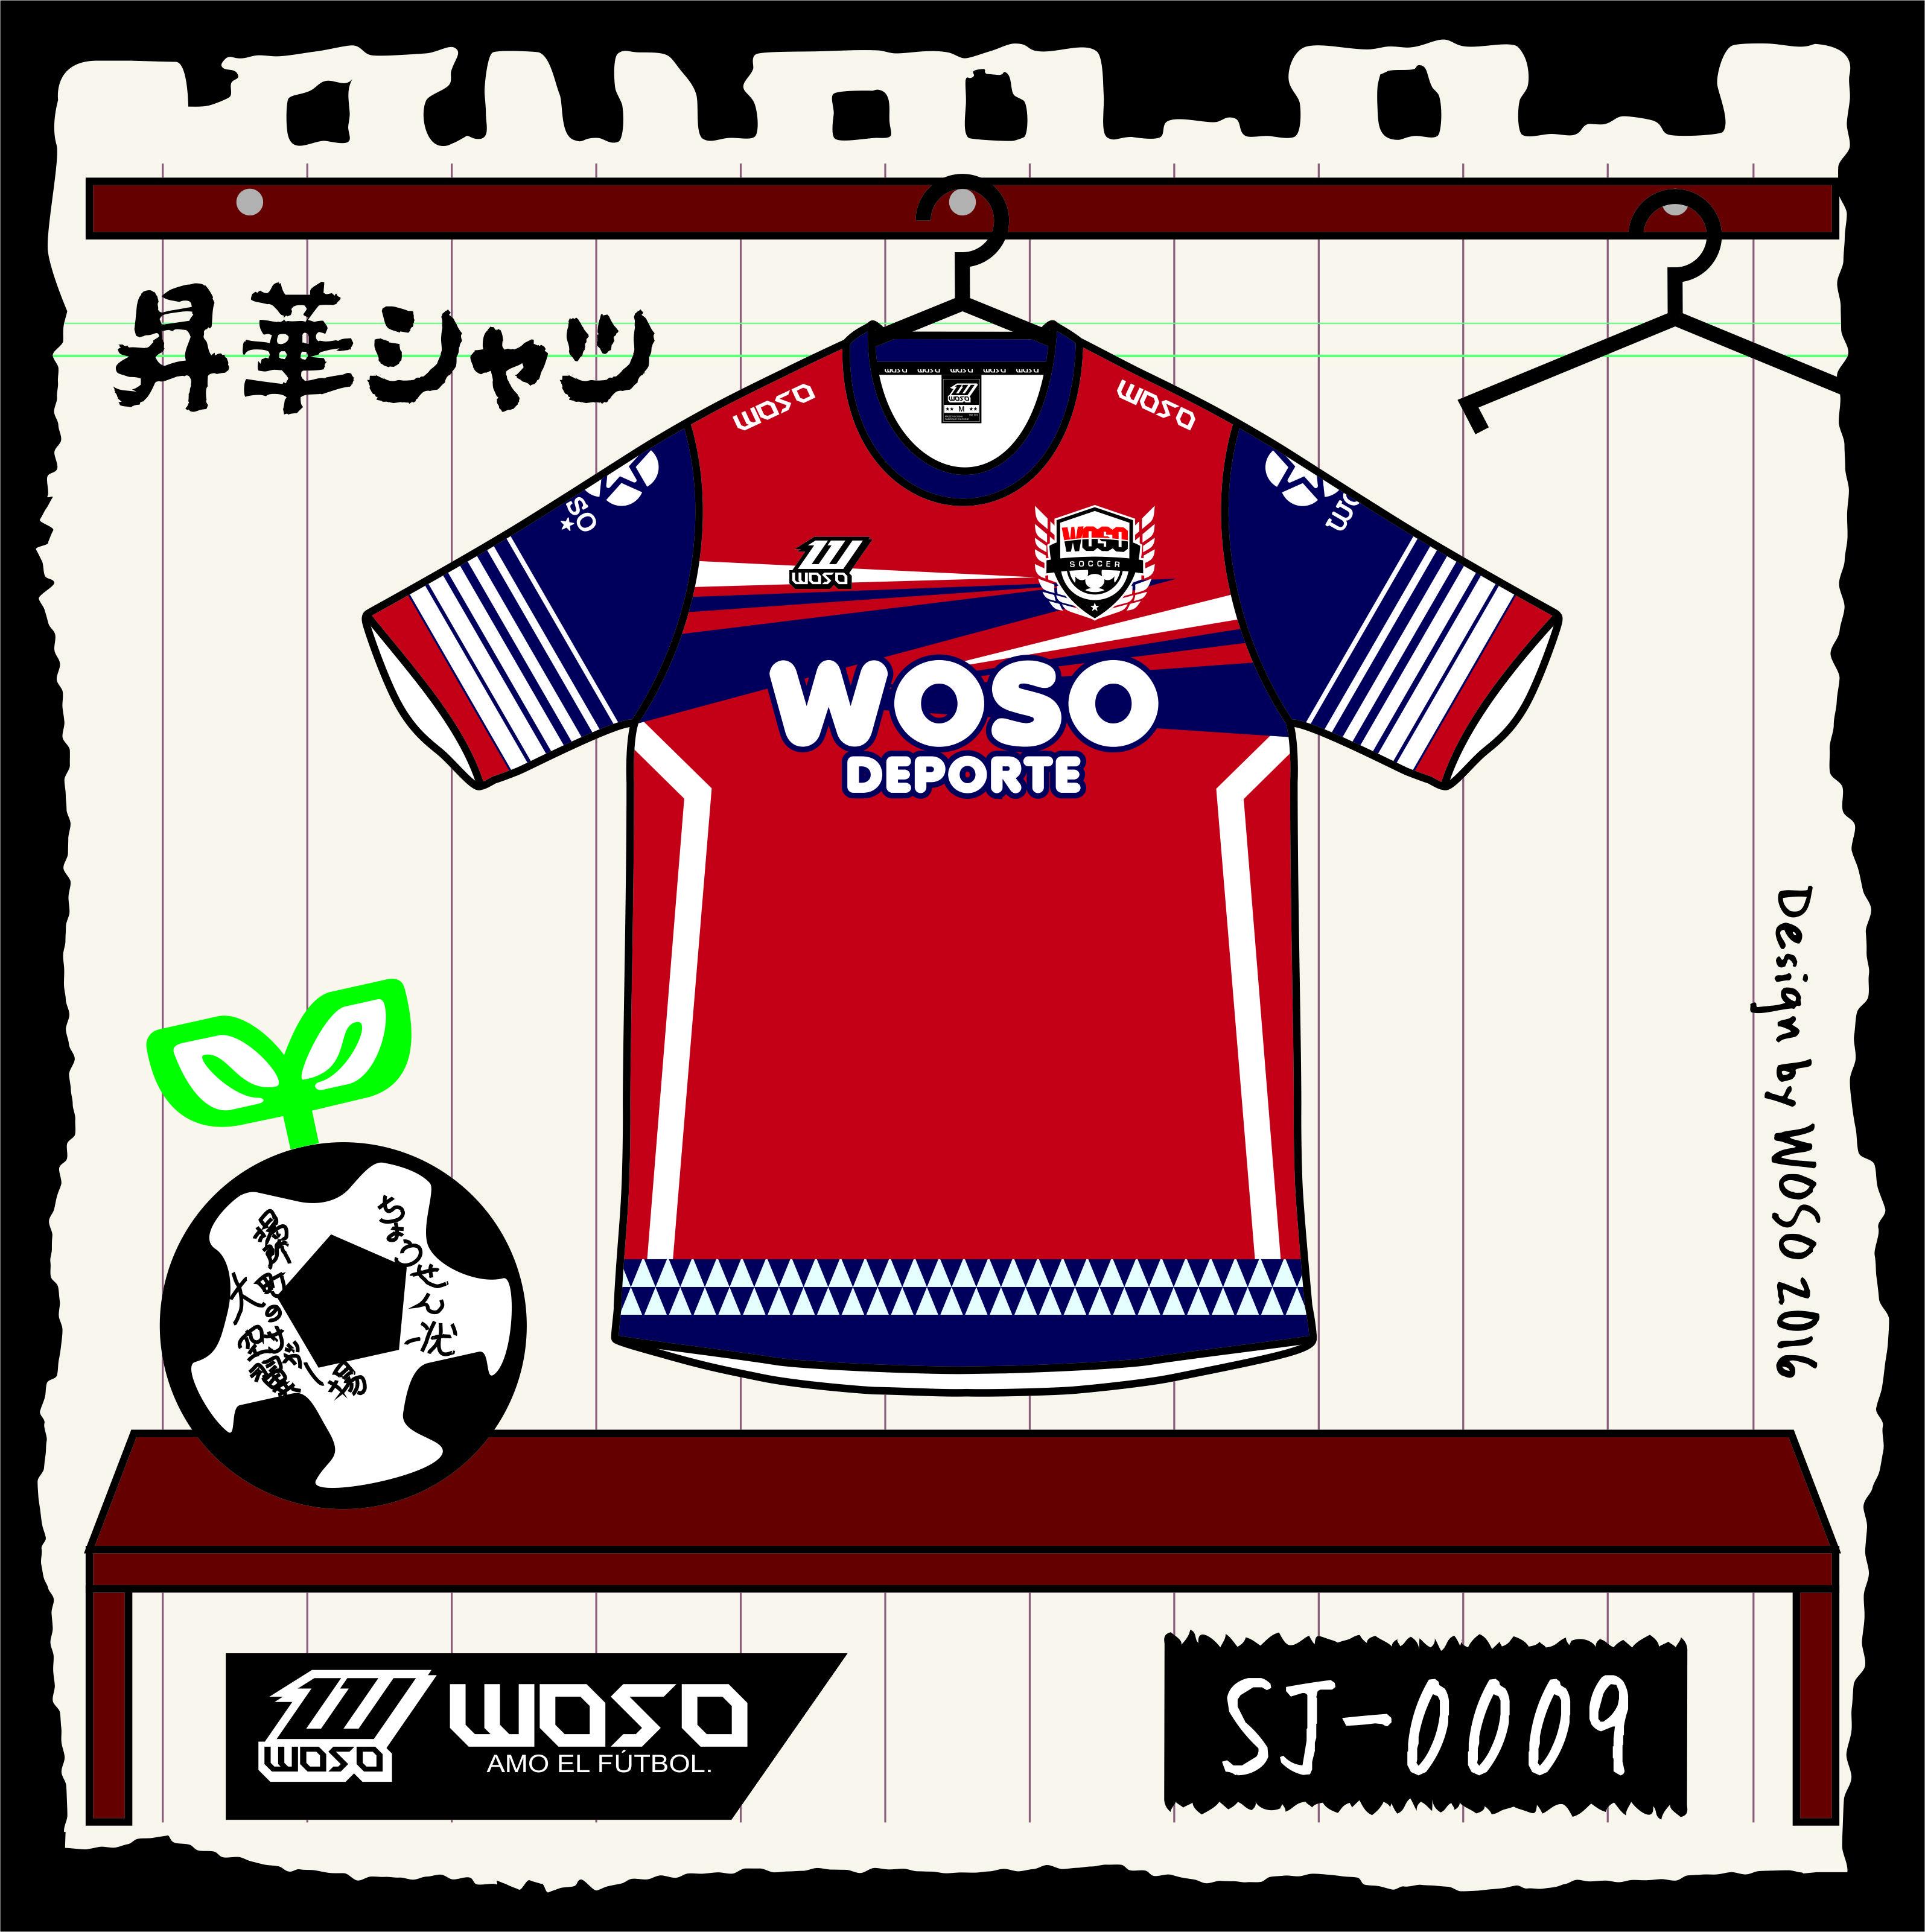 SJ-0009